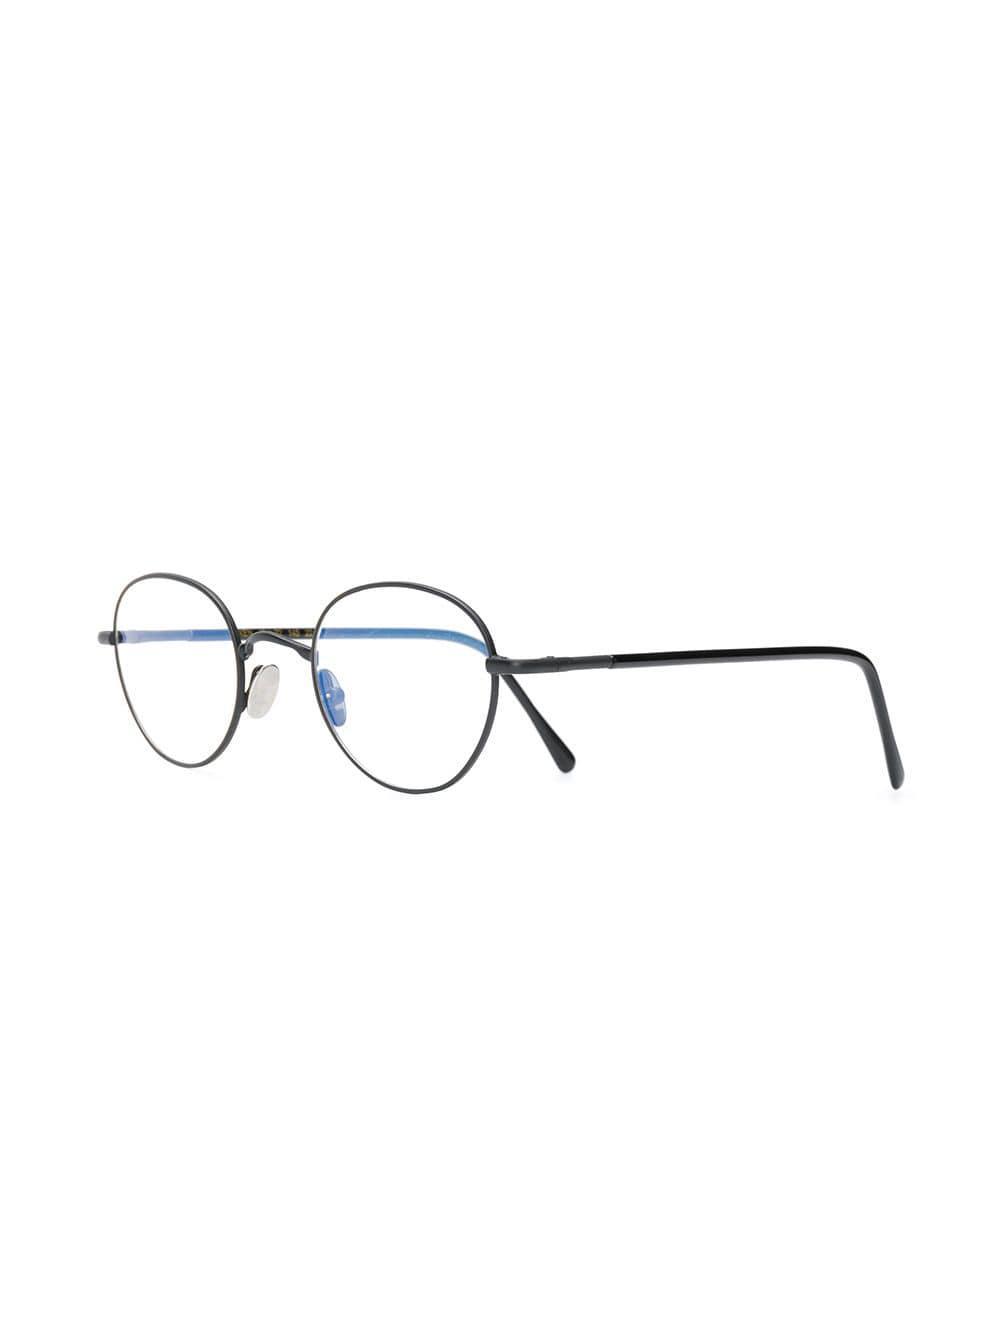 241b7e8080 Lgr - Black Classic Round Glasses - Lyst. View fullscreen